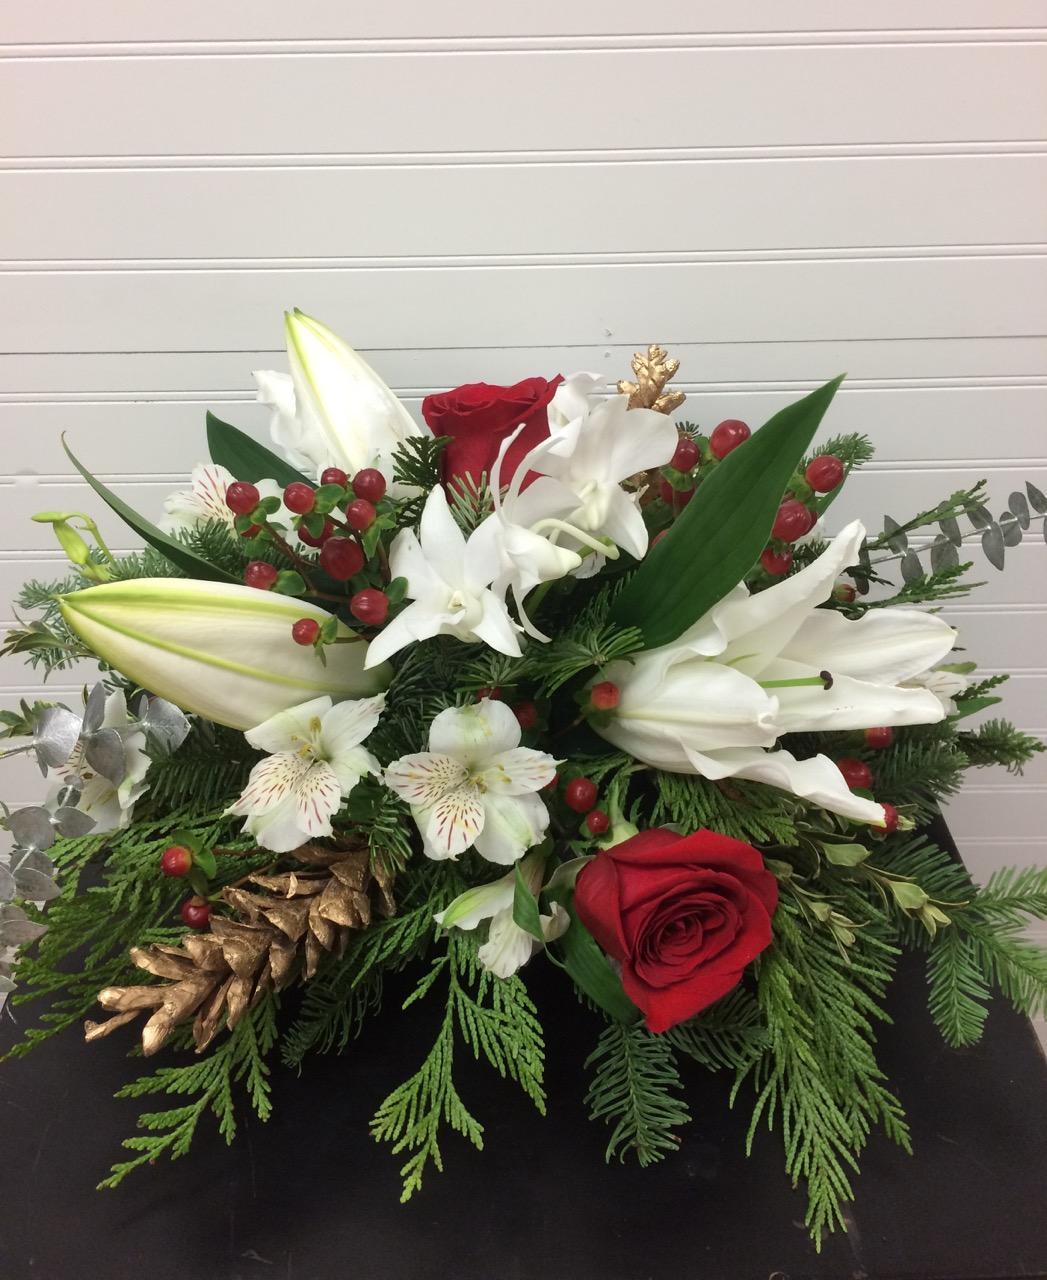 reba_Christmas_flowers_lilies_roses_spiritedtable_photo1.jpg